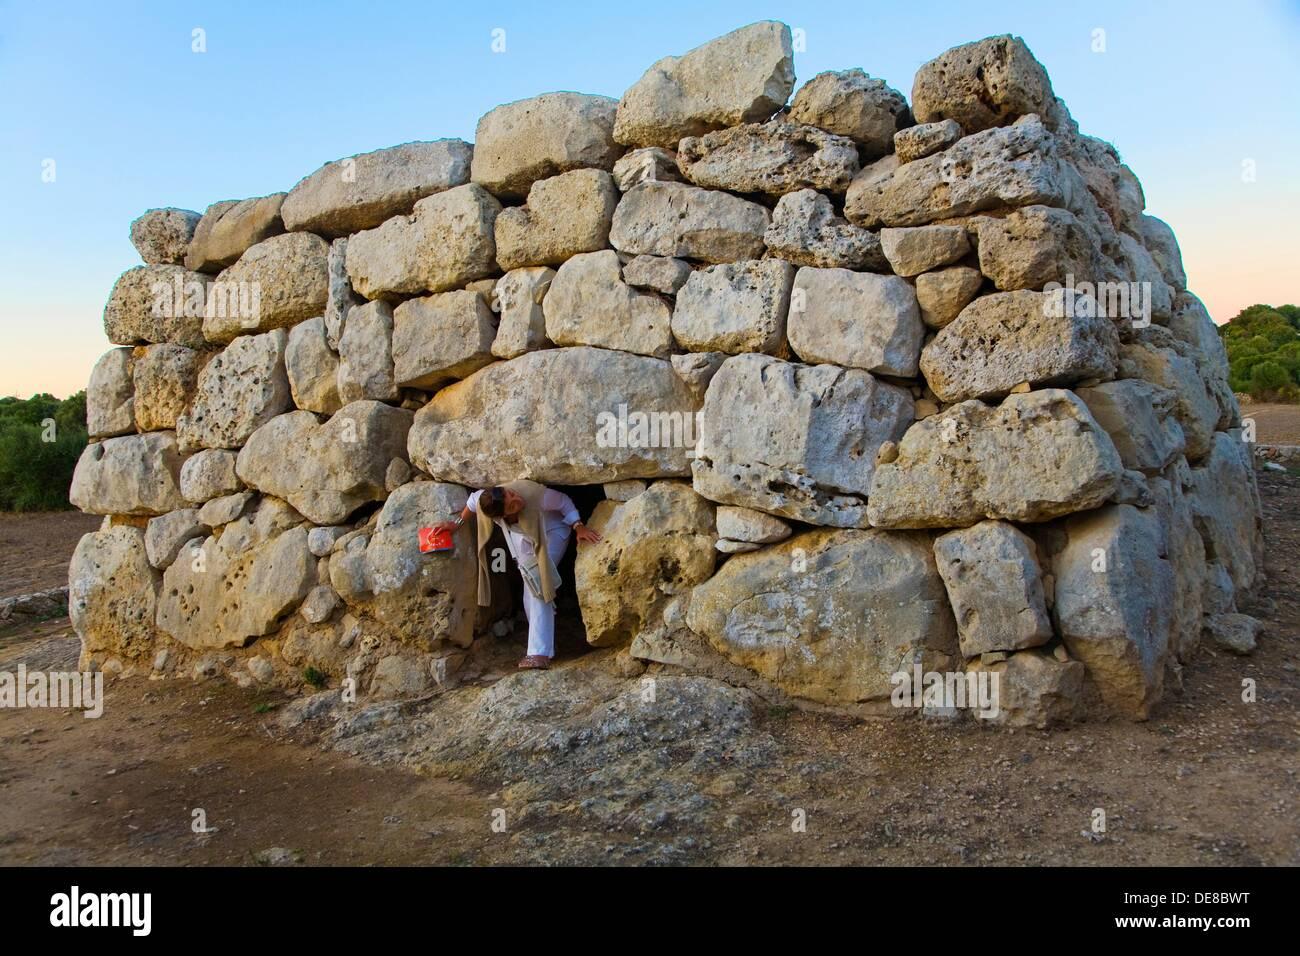 Rafal Rubi funerary building. Minorca. Balearic Islands. Spain. - Stock Image